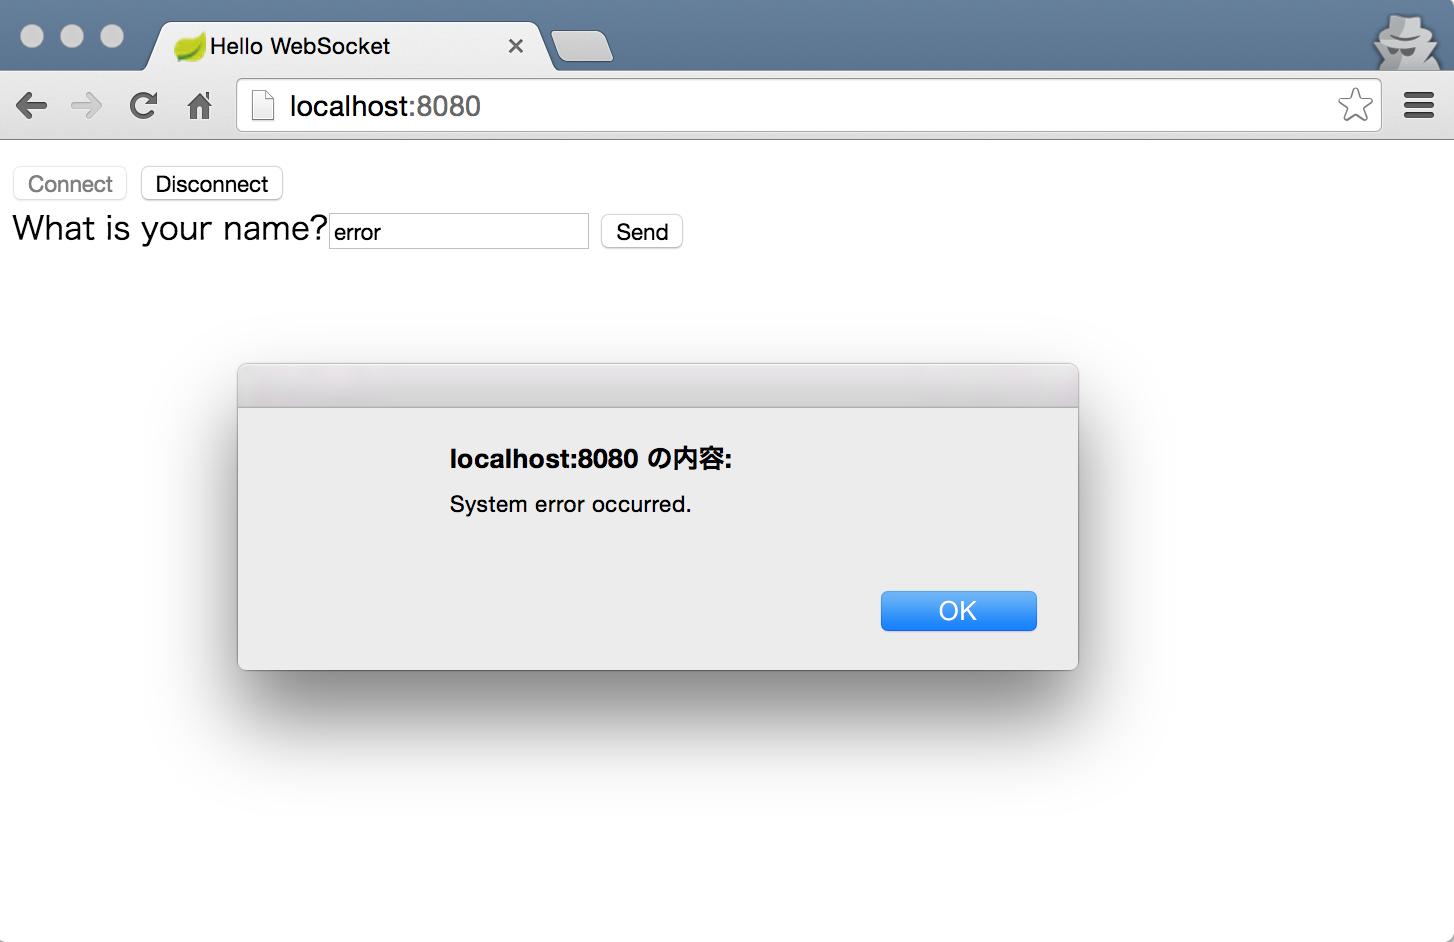 spr43-websocket-error.png